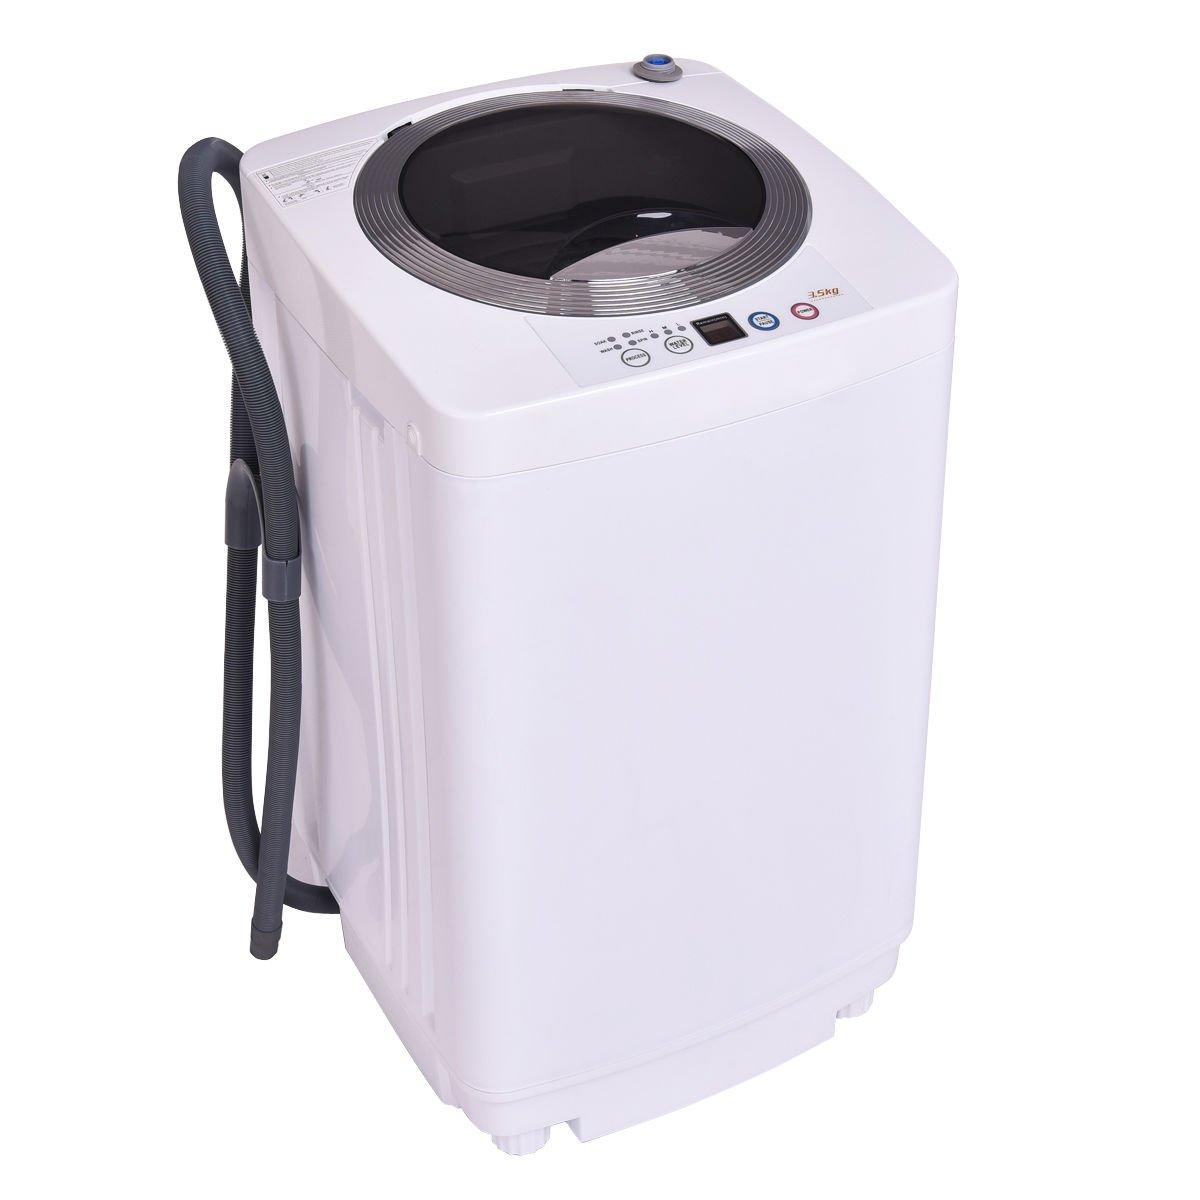 9 Best Washing Machine 2019-2020-Top Loaded